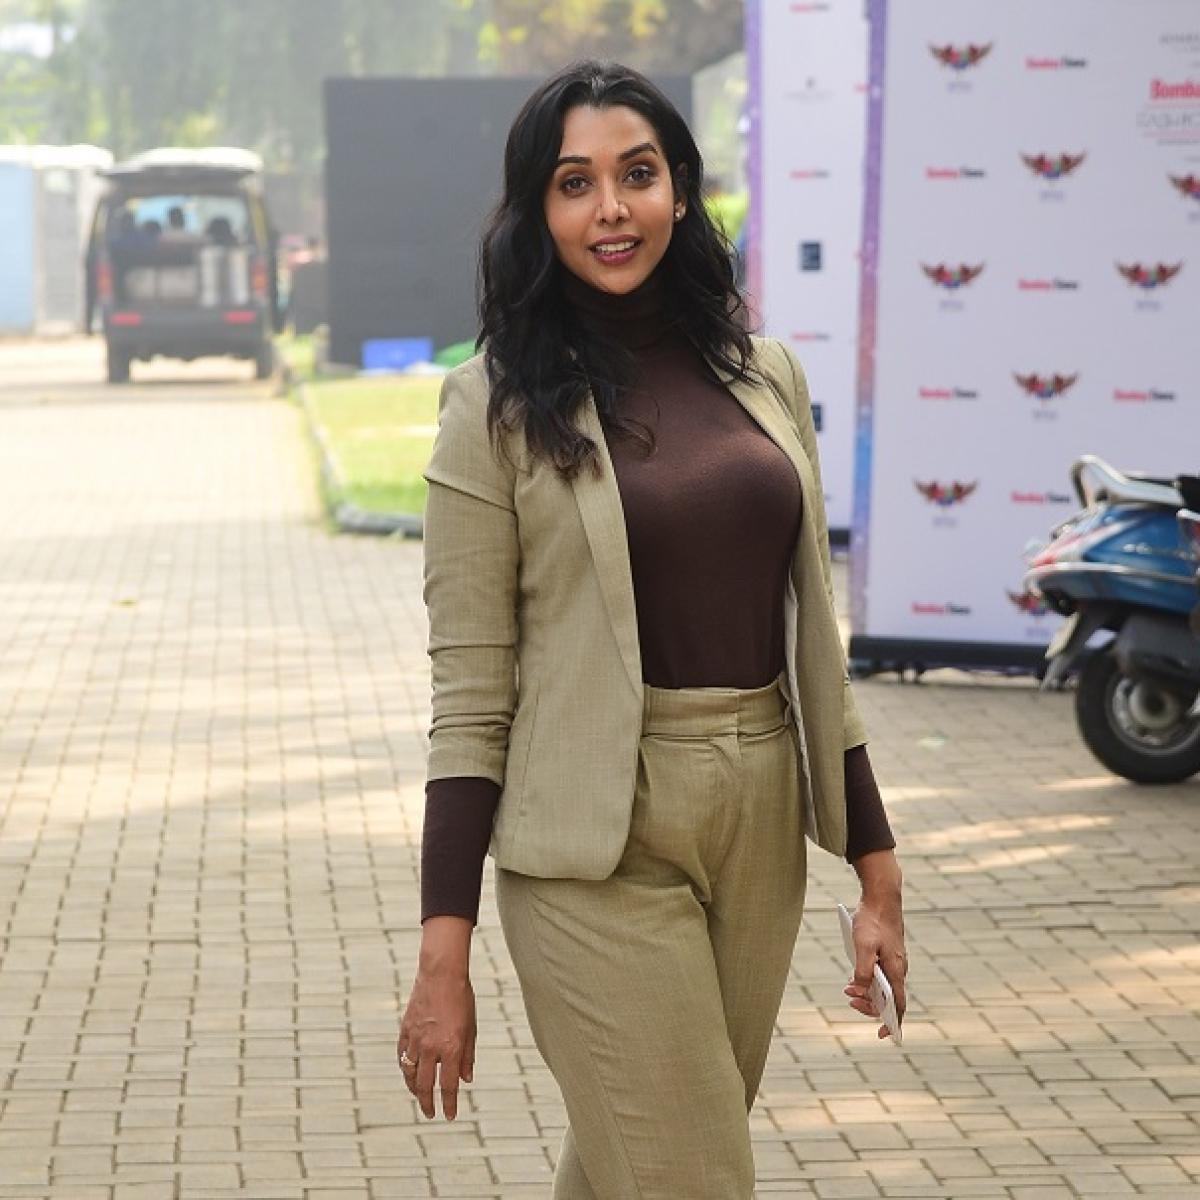 'Padmaavat' actor Anupriya Goenka unlocks the vault of her past